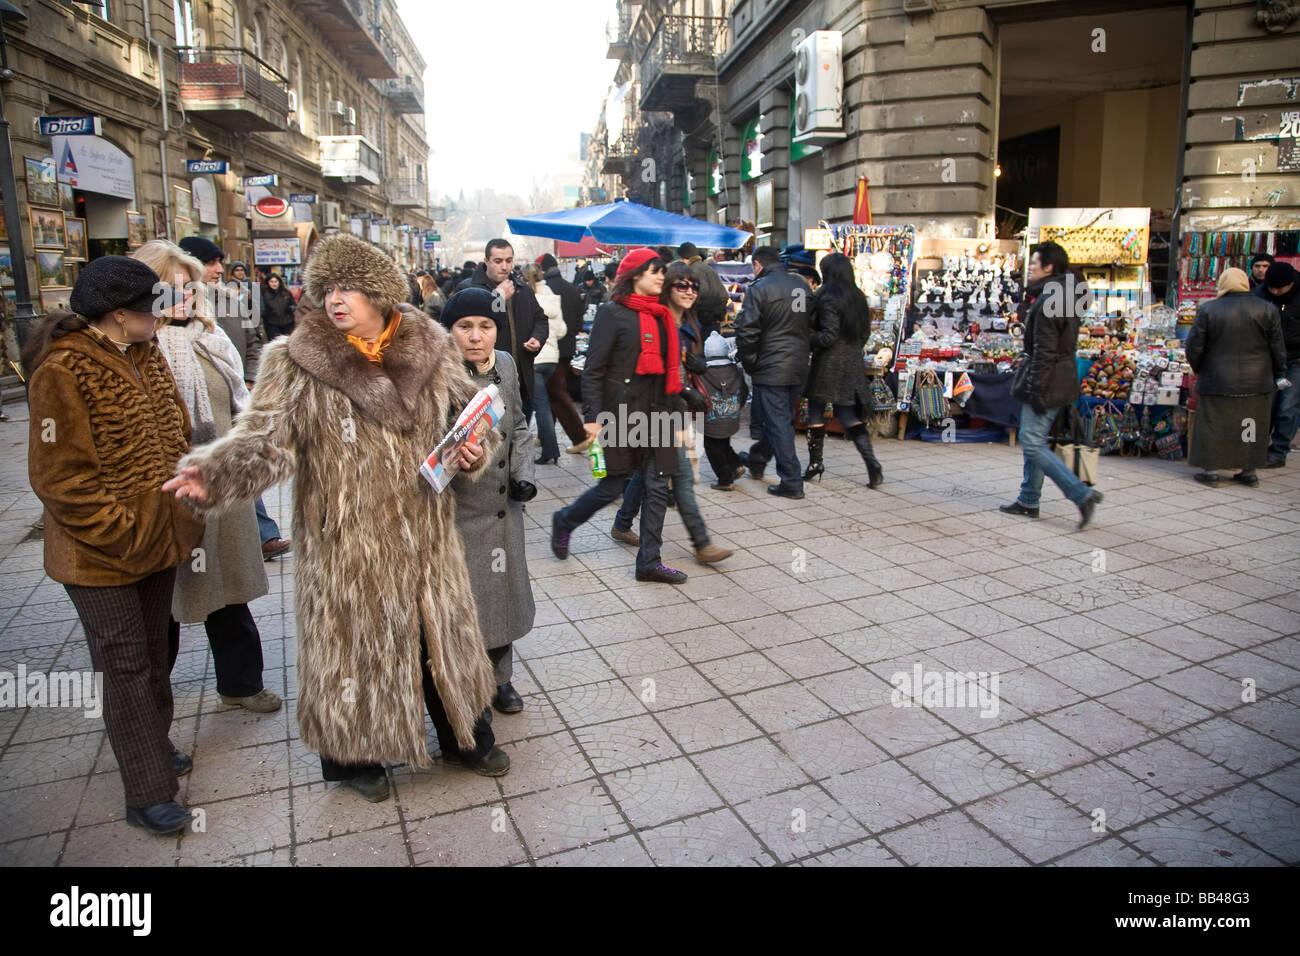 Woman in fur coat shopping in Baku, Azerbaijan - Stock Image